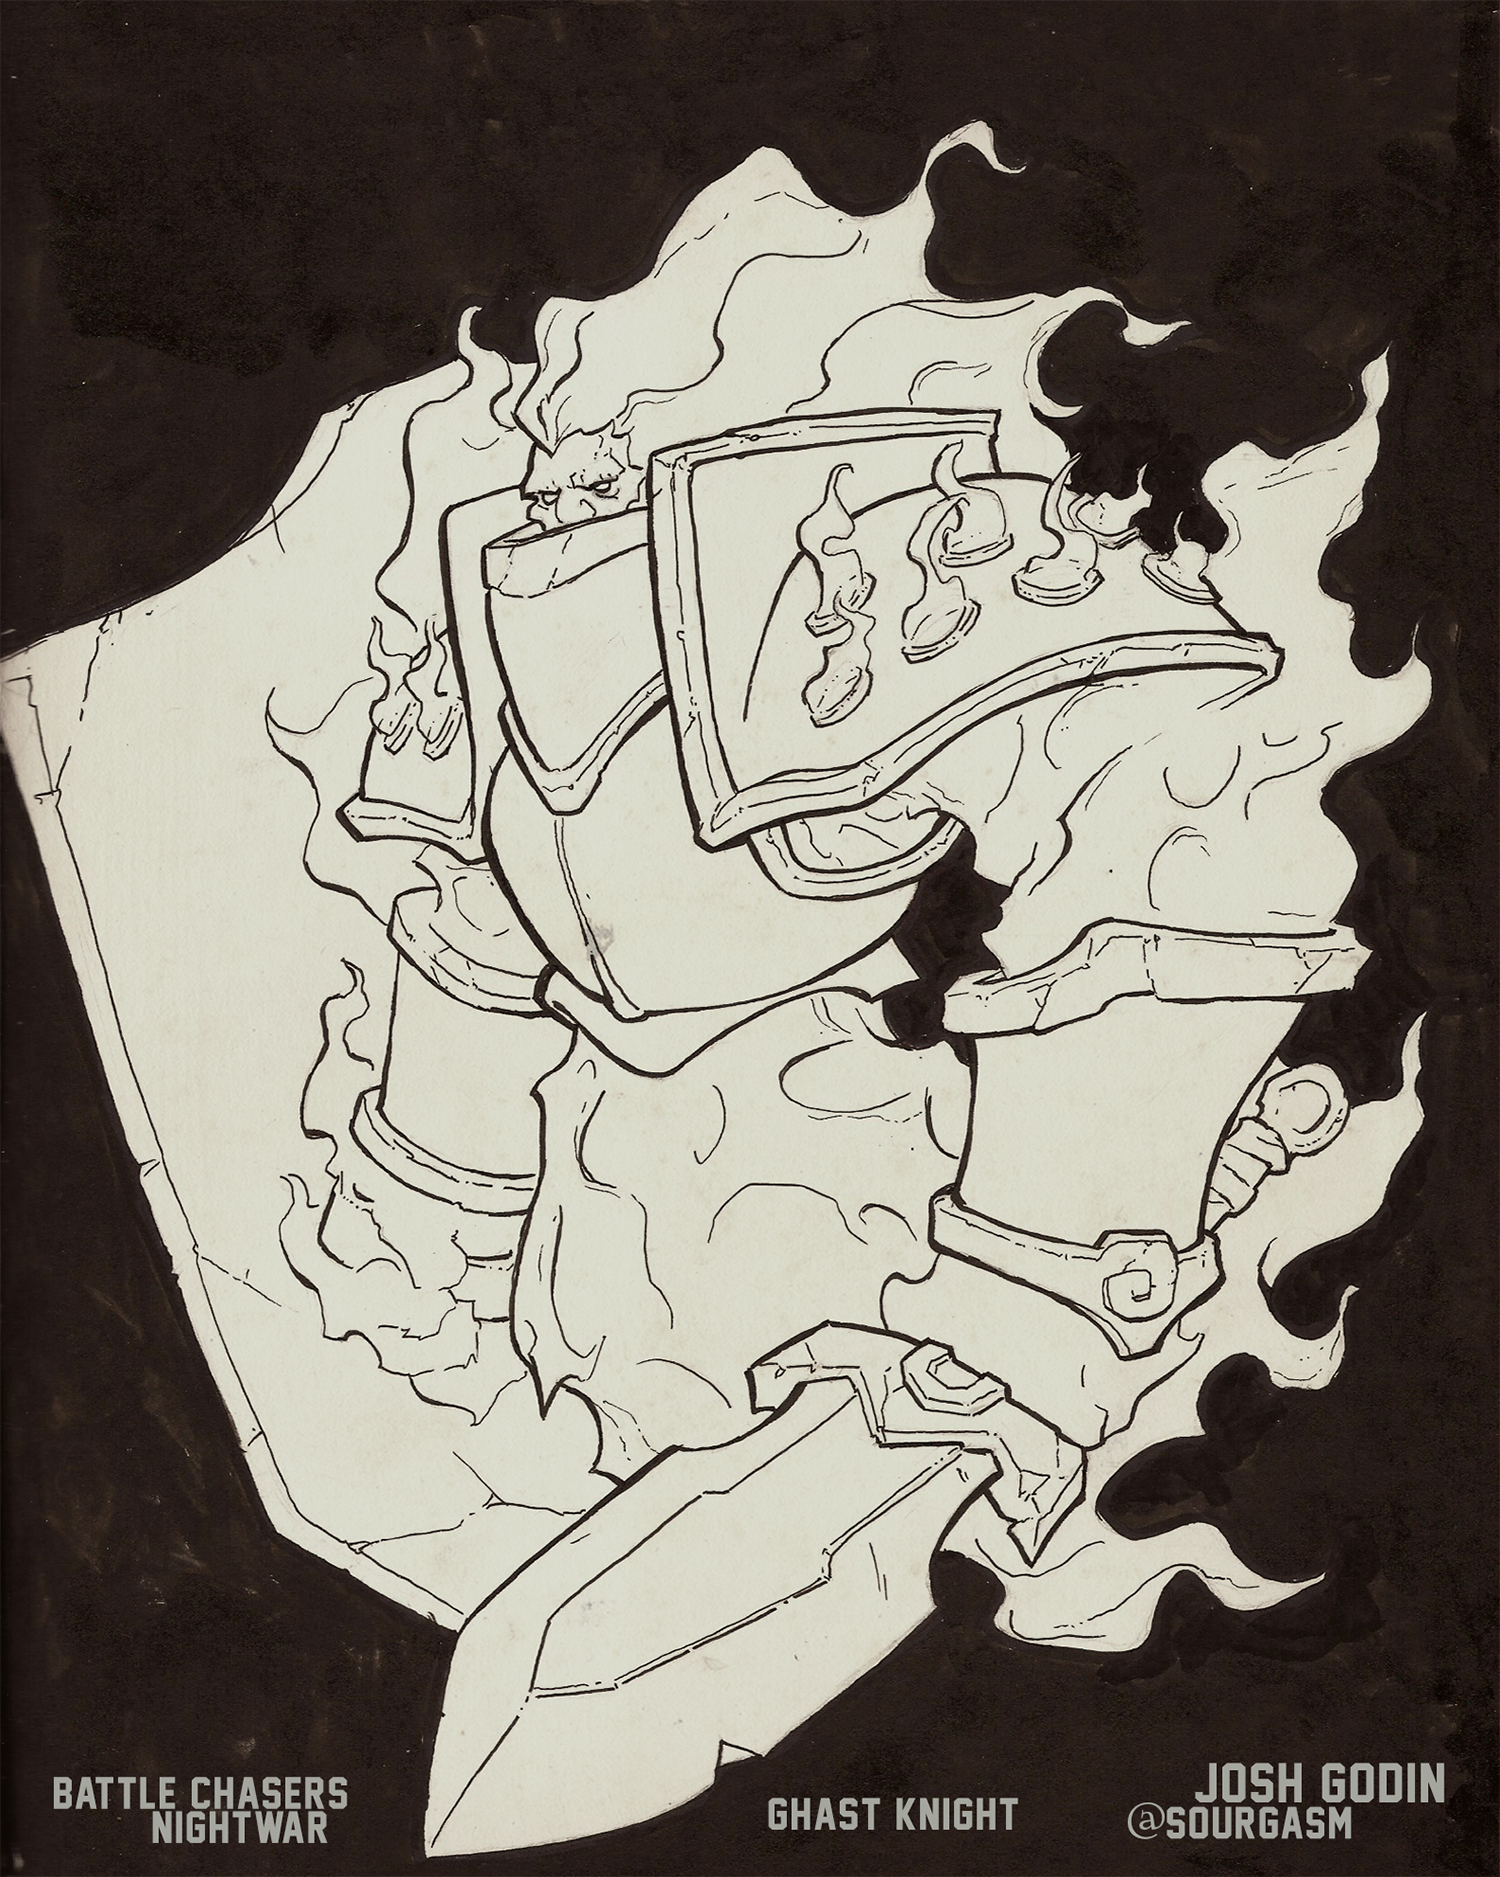 josh-godin_battle-ghast-knight.jpg